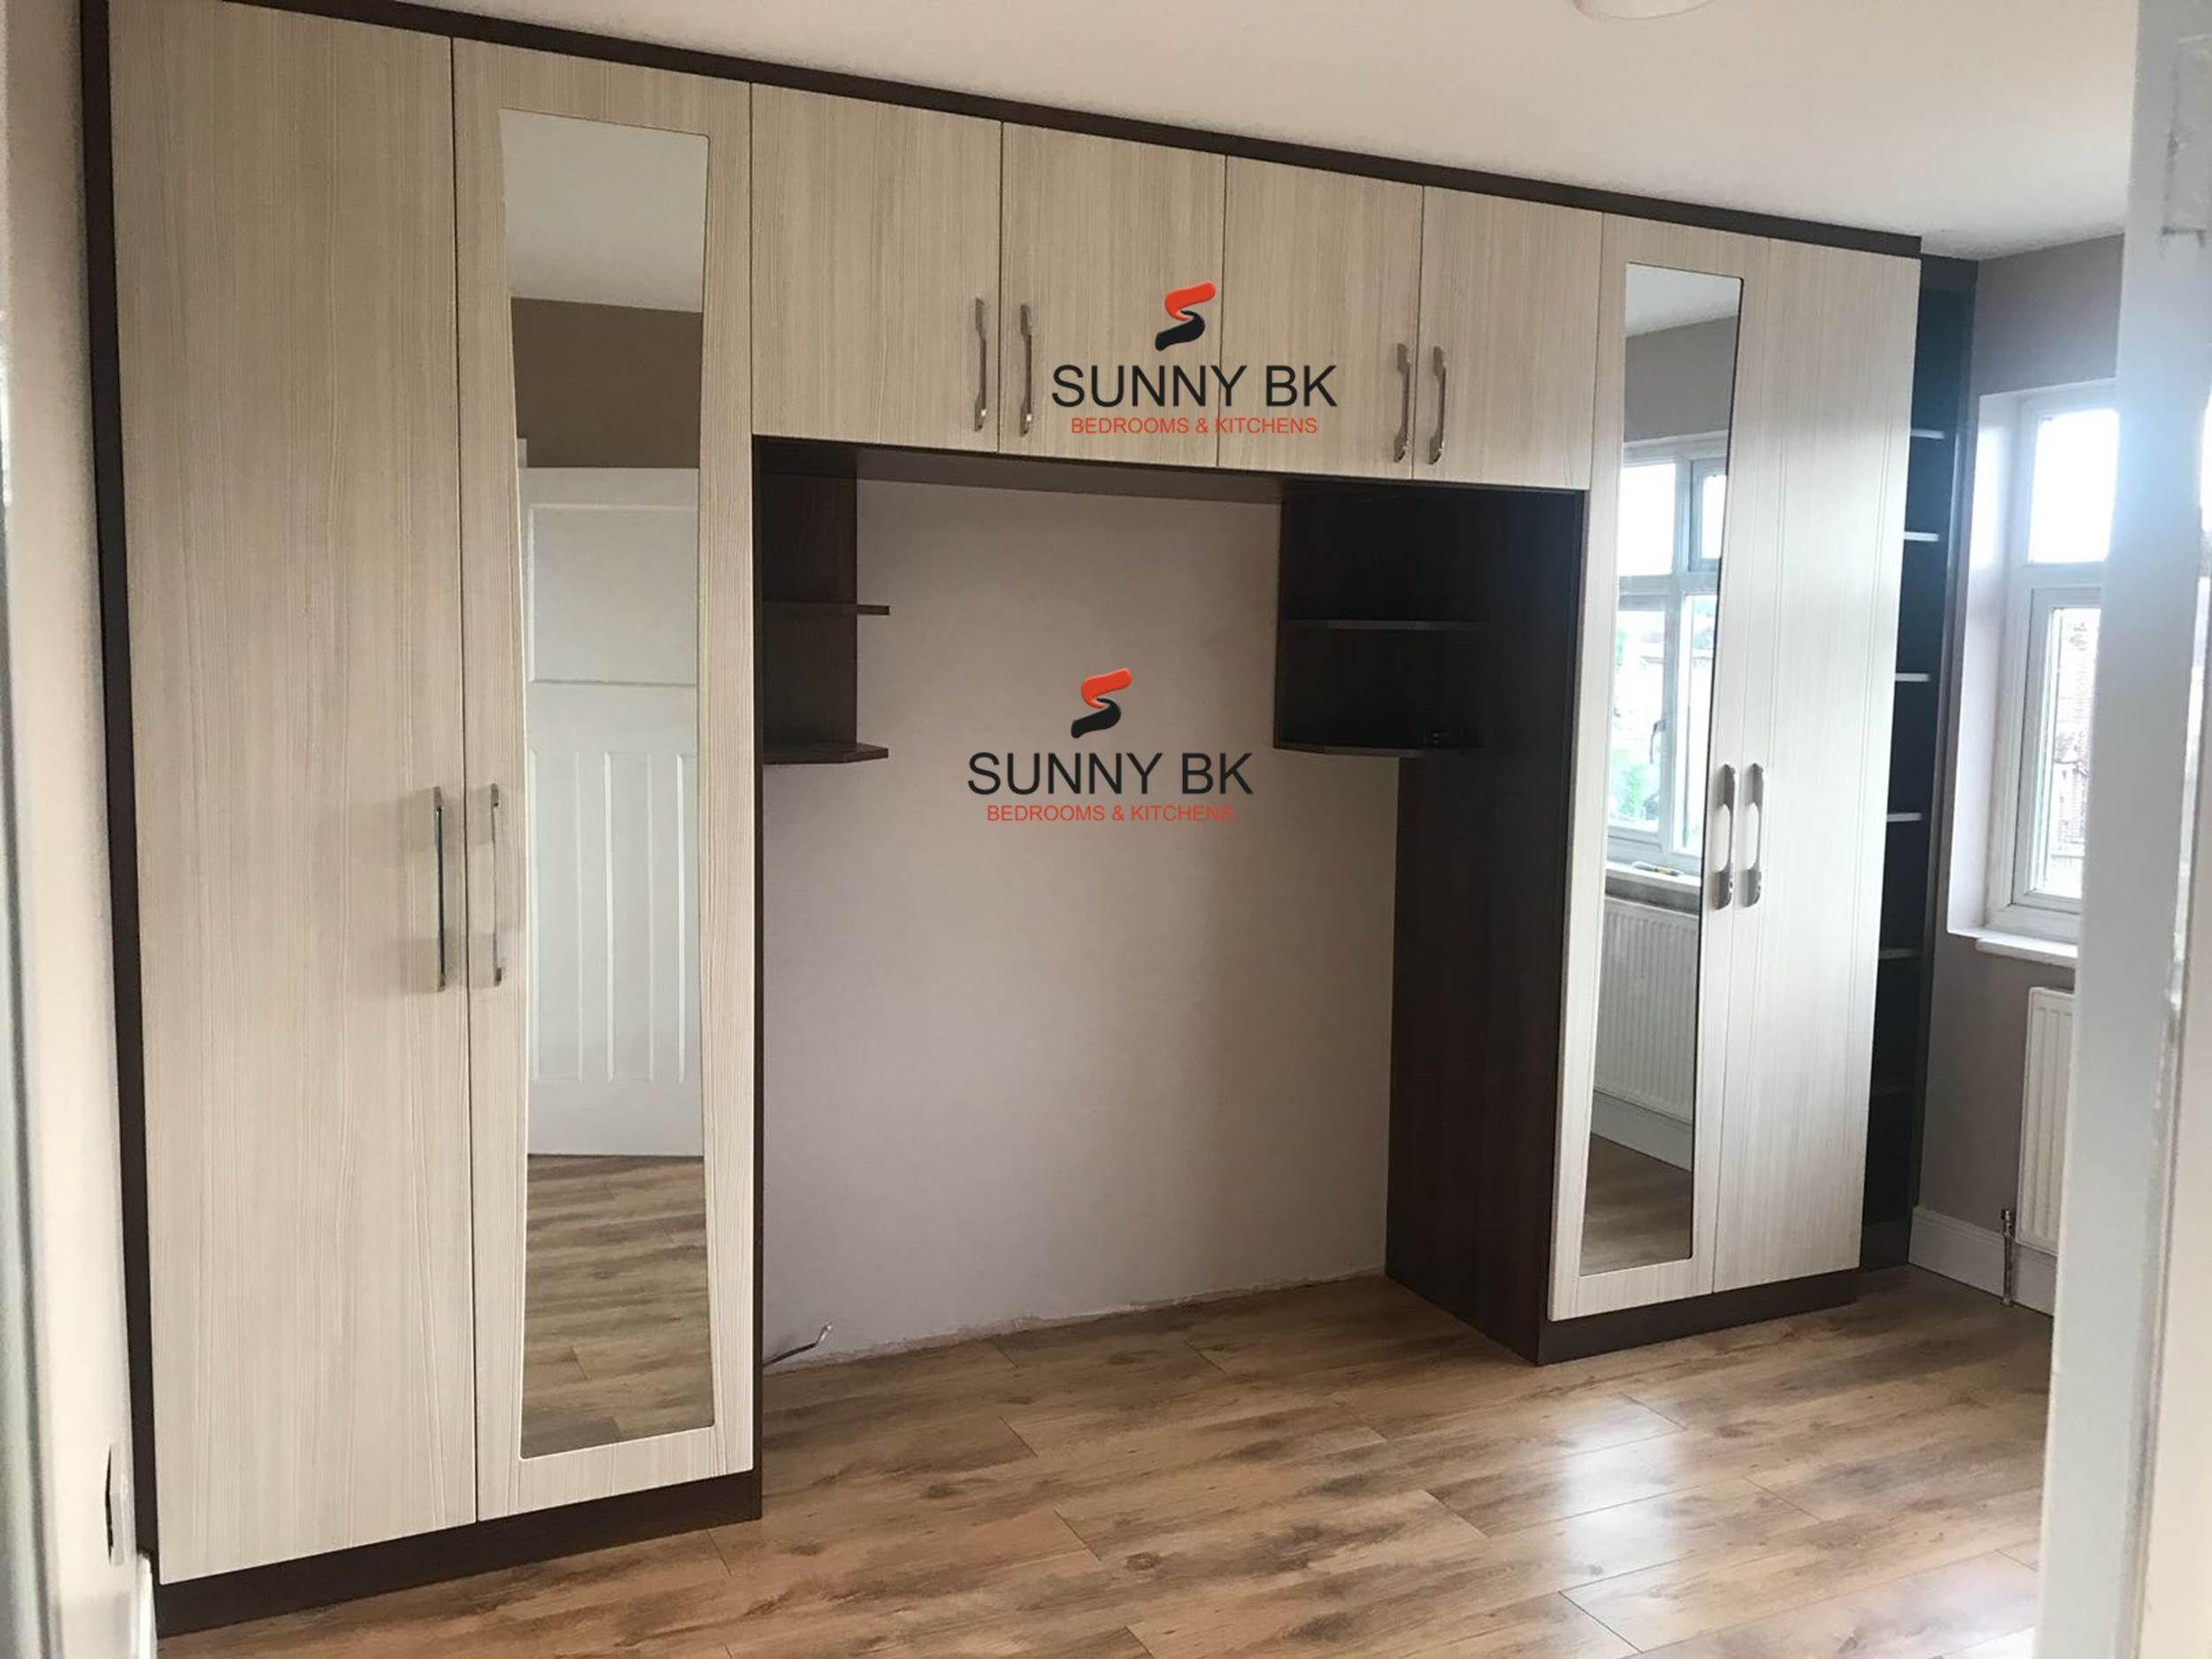 Sunny Bk Fitted Bedrooms Bedroom Led Furniture